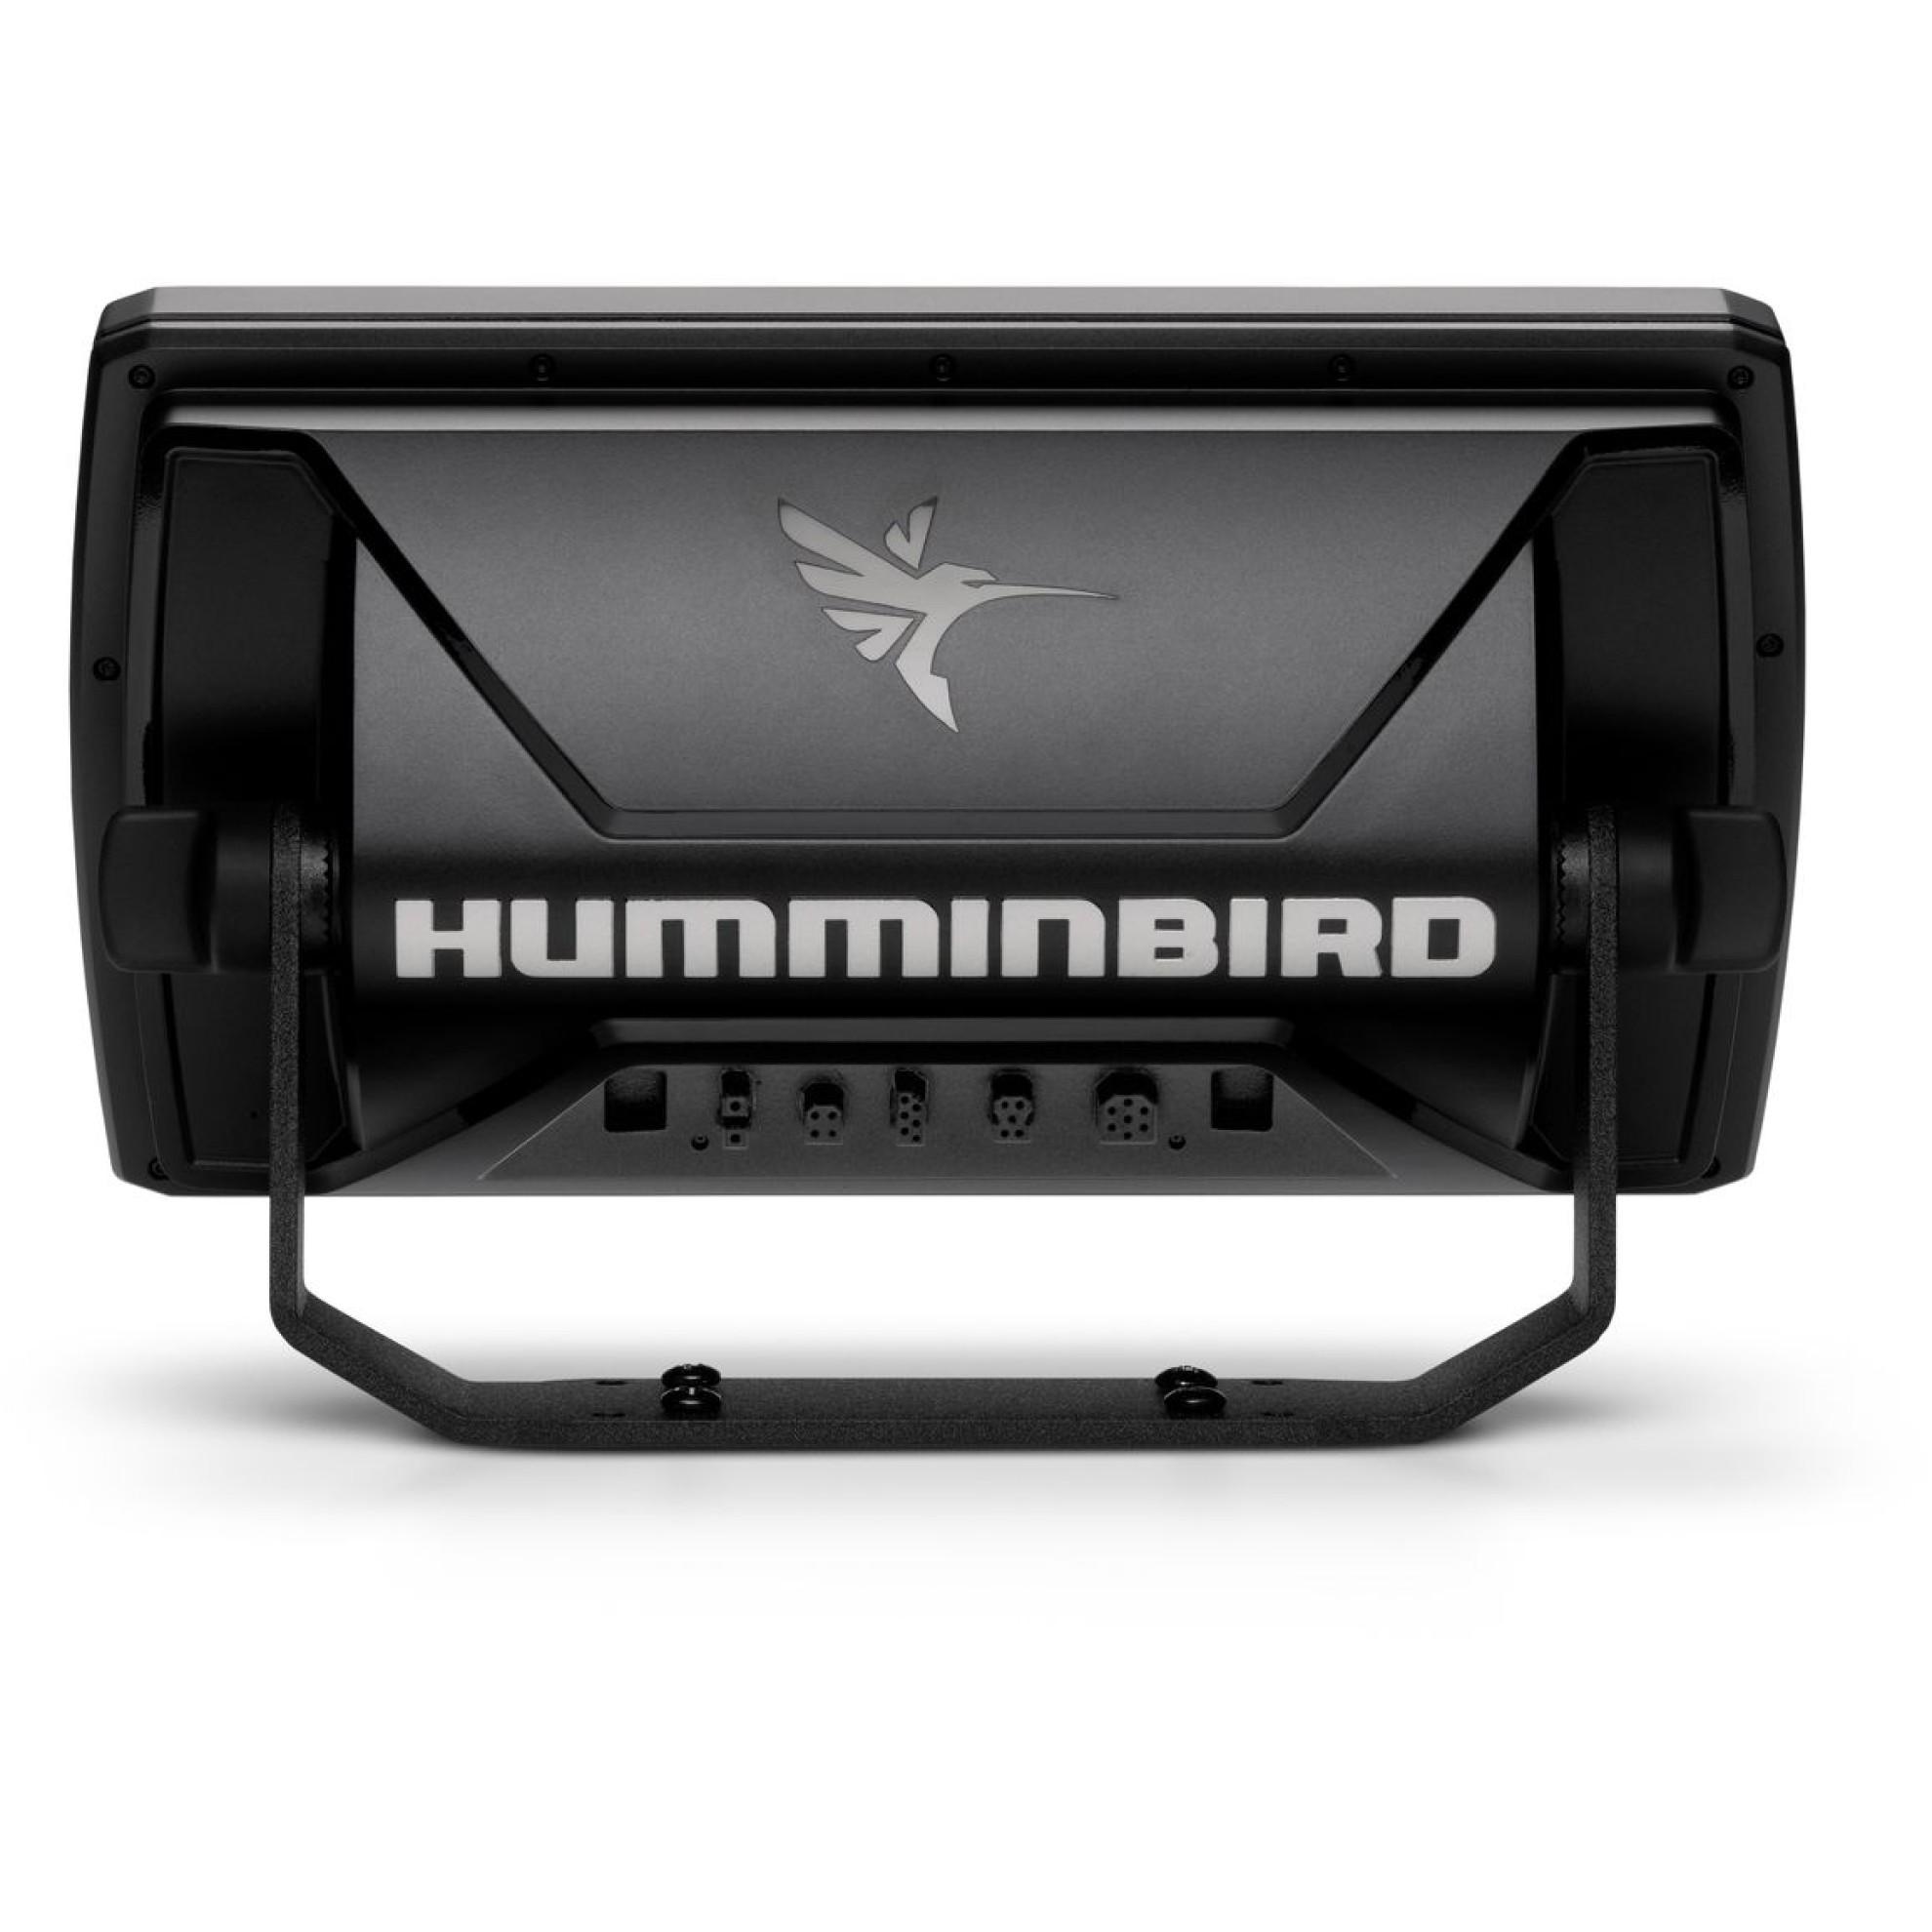 Humminbird HELIX 9 Chirp Mega SI+ GPS G3N, Fishingtackle24